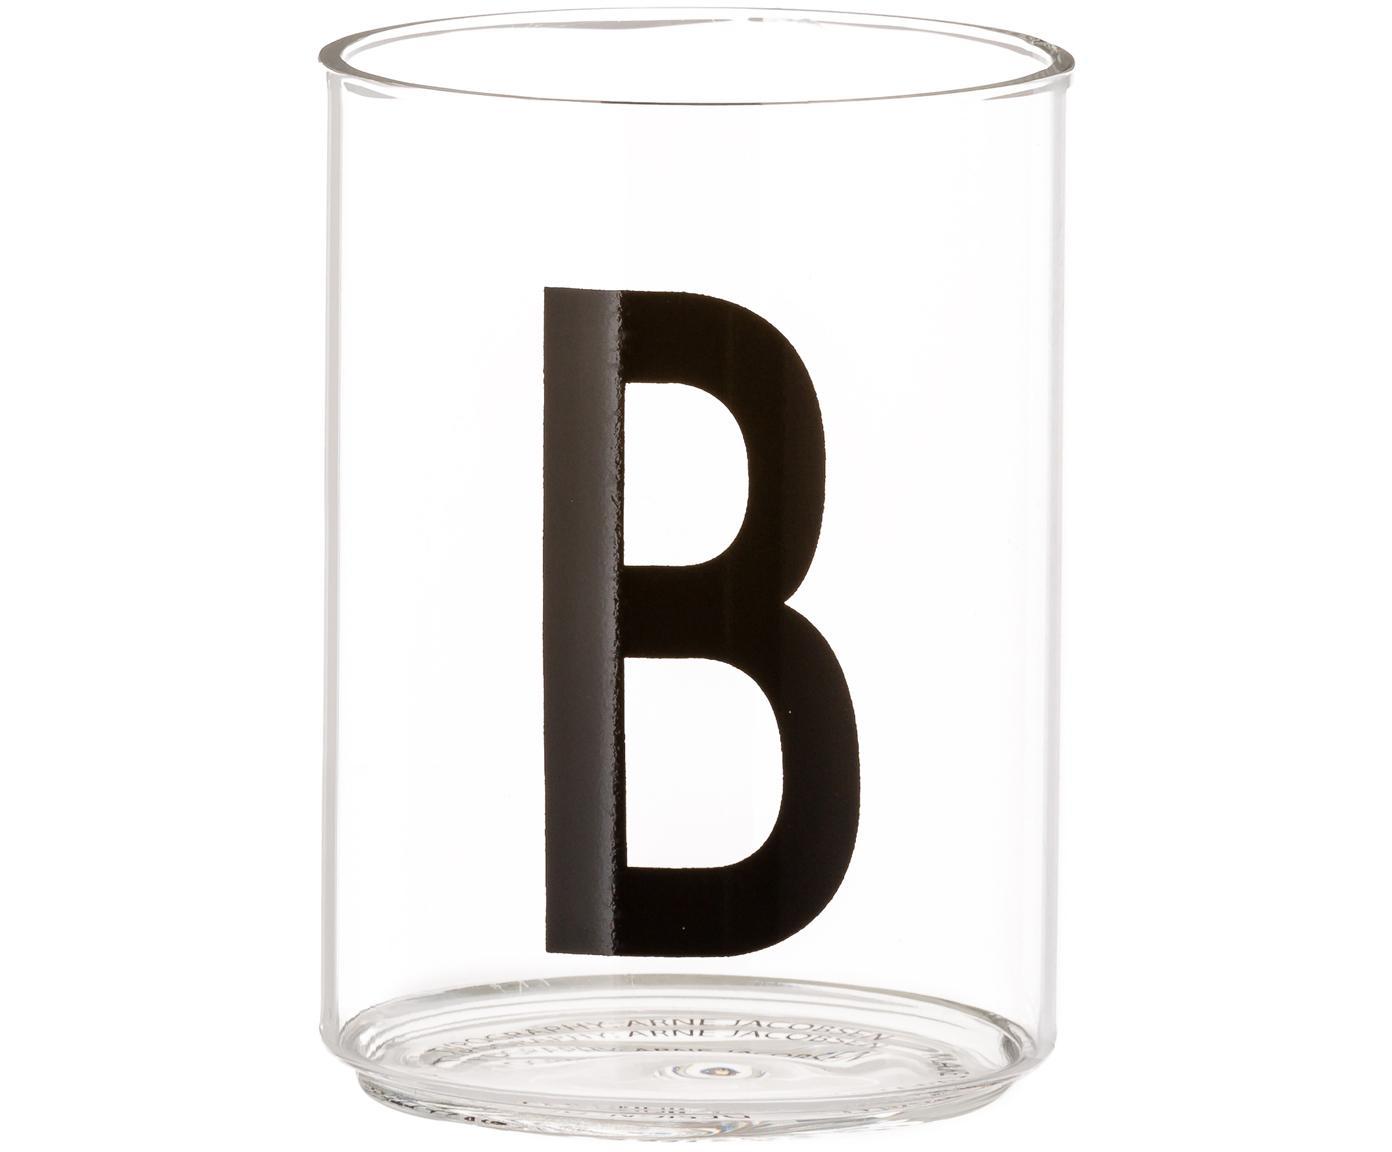 Waterglas Personal met designletters (varianten van A tot Z), Borosilicaatglas, Transparant, zwart, Waterglas B